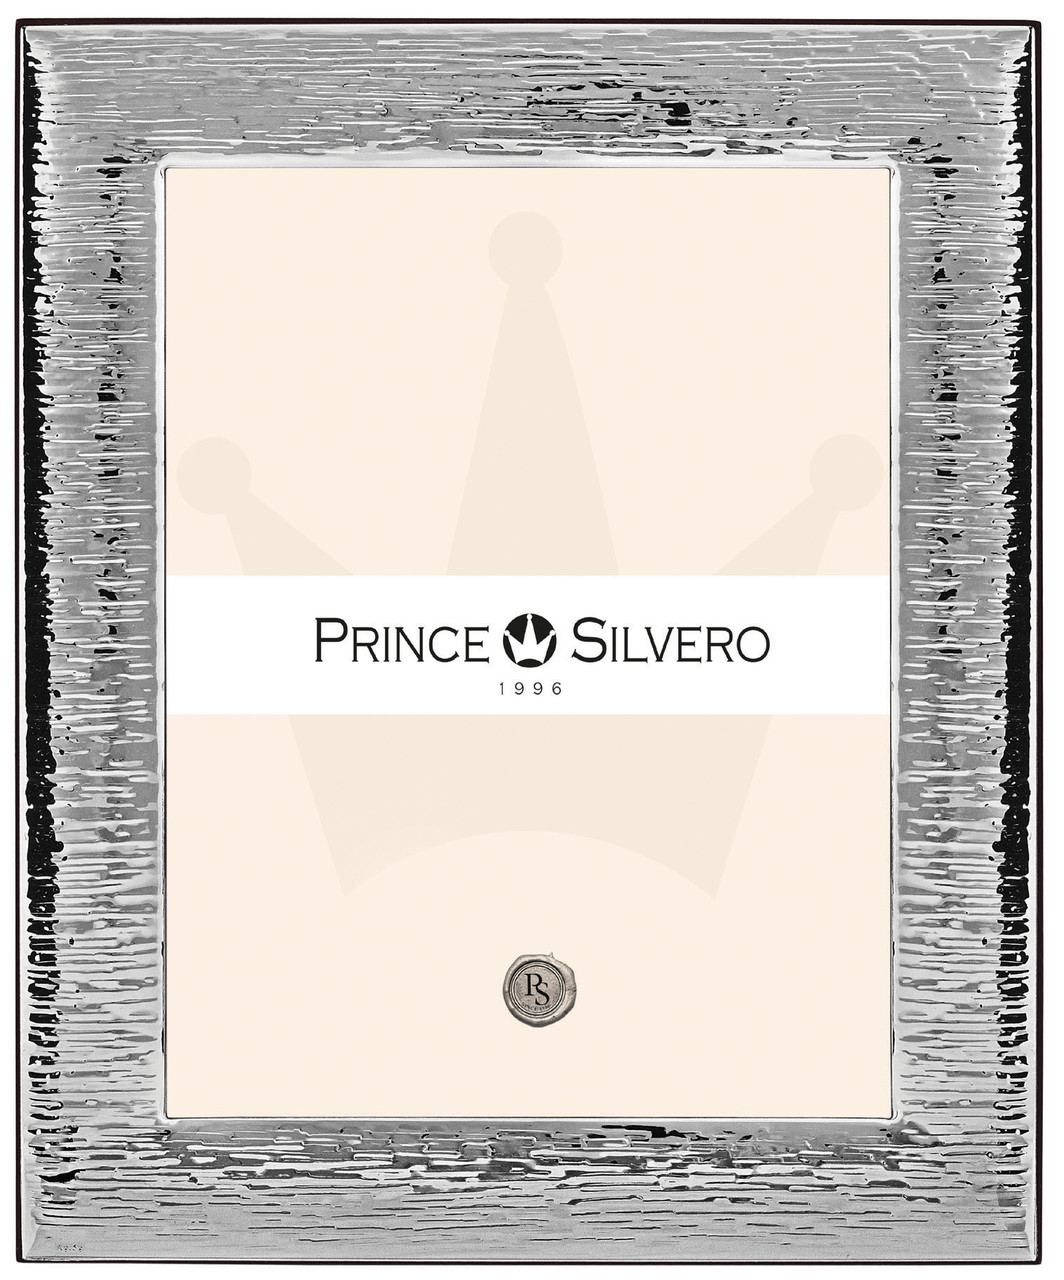 Эксклюзивная фоторамка 20Χ25 от Prince Silvreo